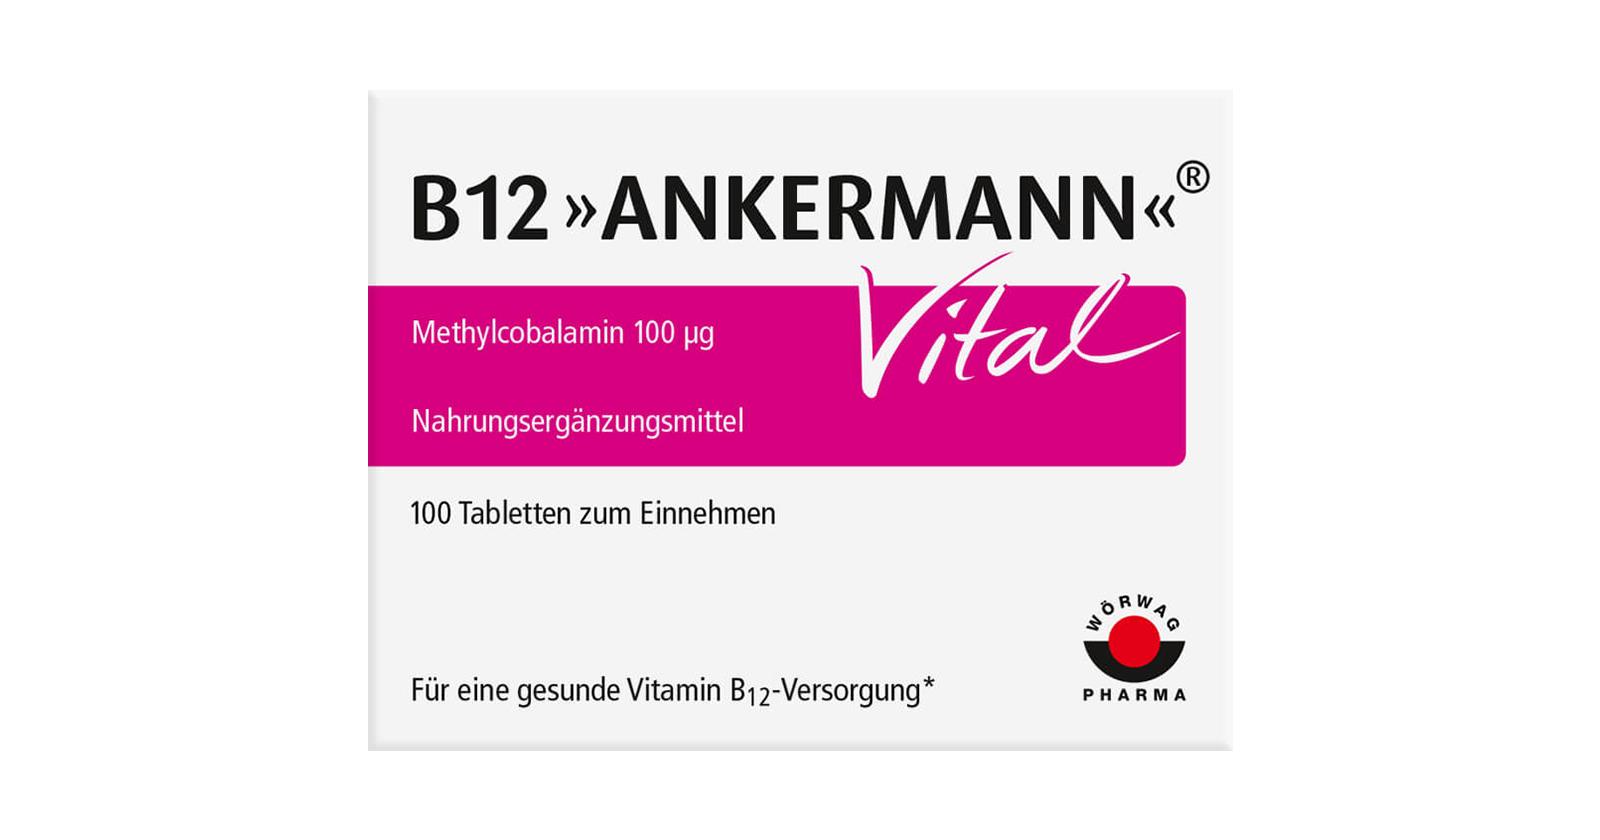 B12 Ankermann Vital Packshot